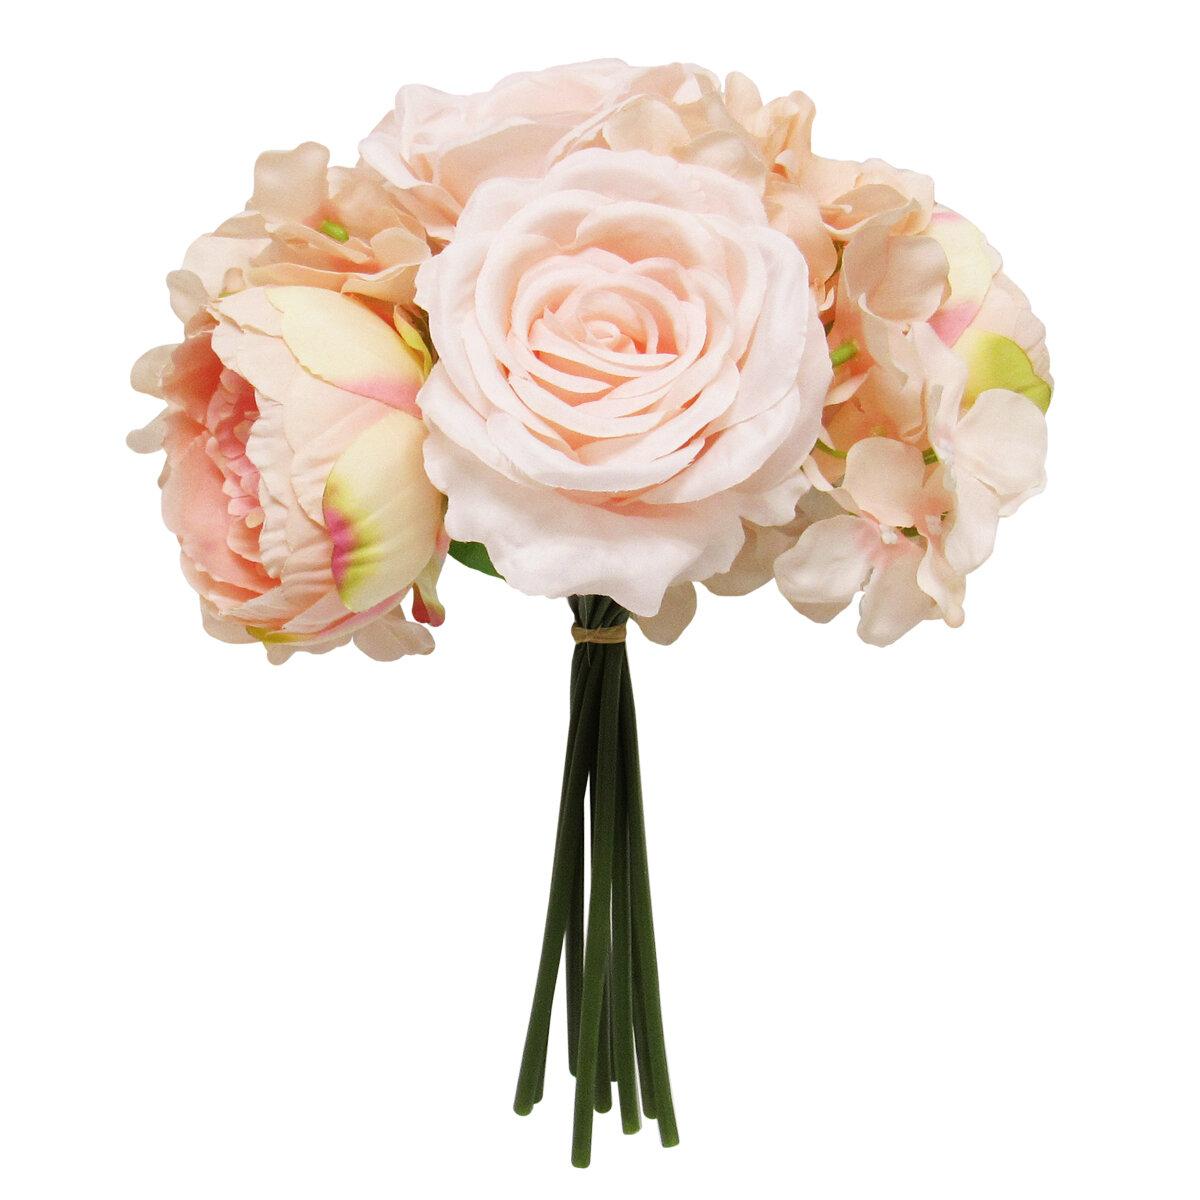 Primrue Rose Hydrangea Peony Bouquet Mixed Stems Wayfair